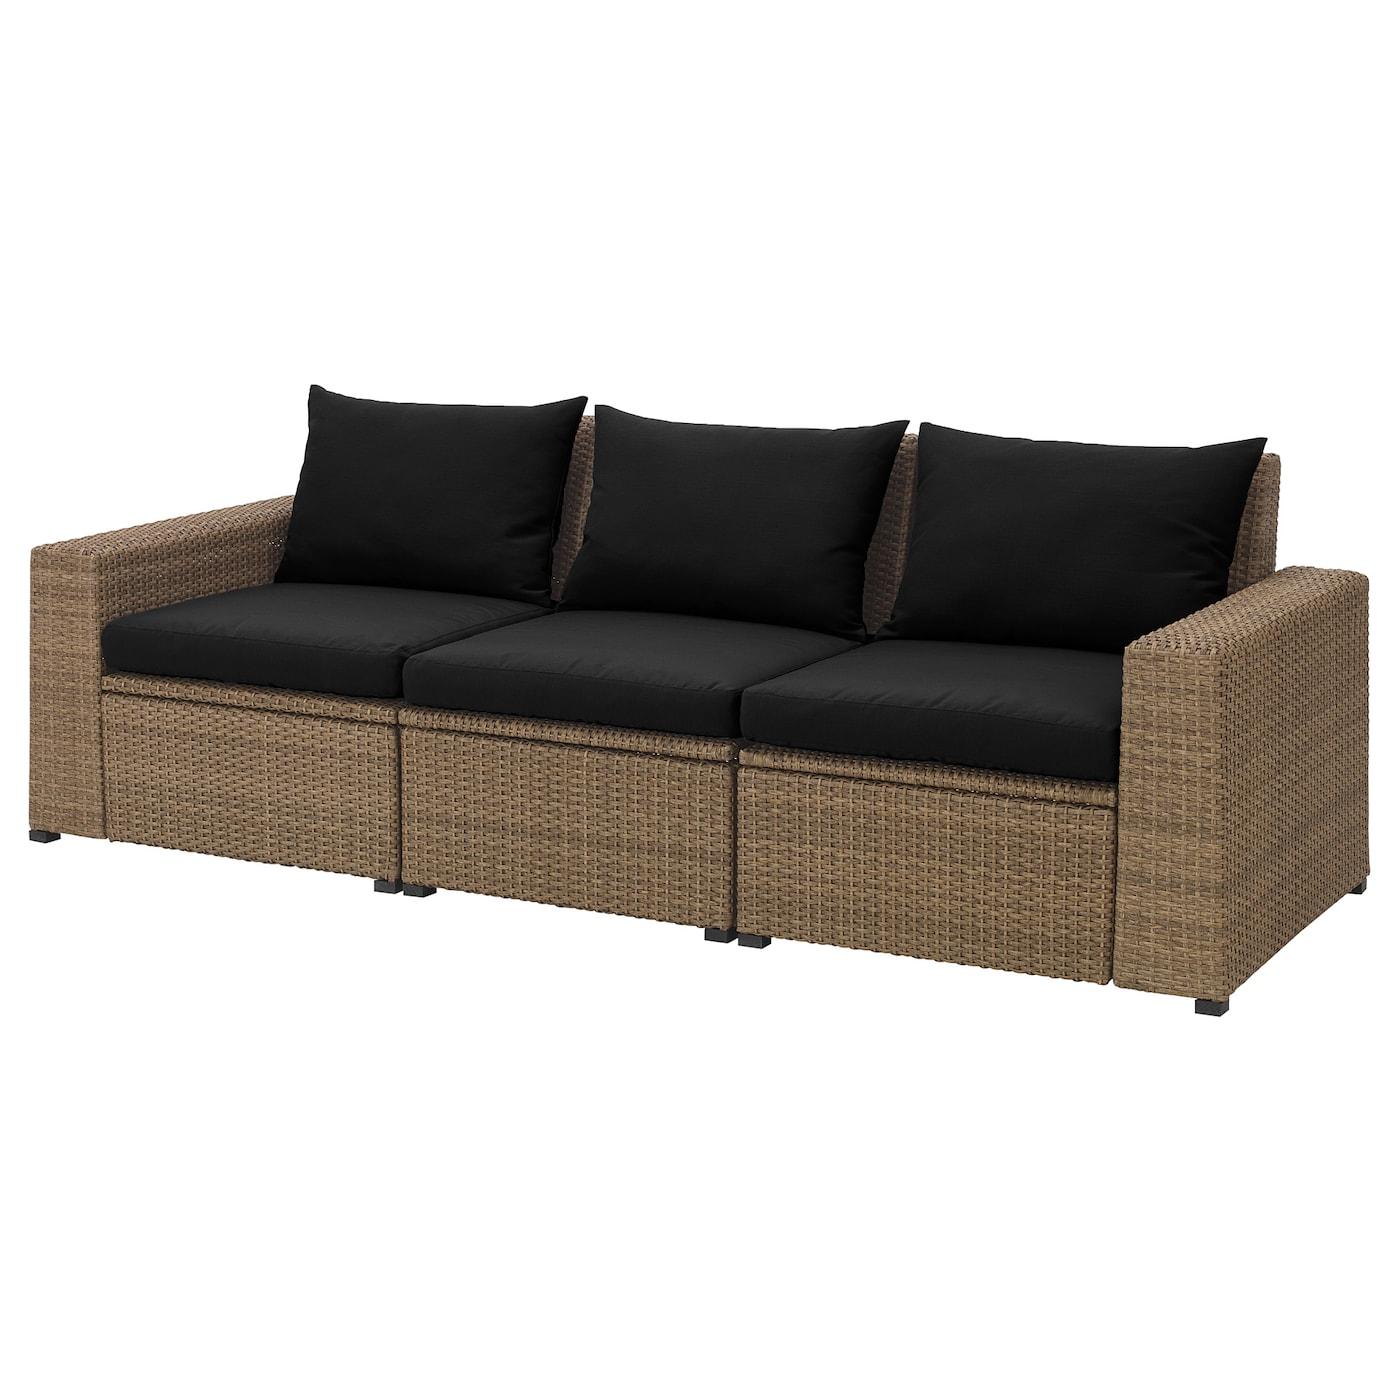 SOLLERÖN 3-seat modular sofa, outdoor, brown, Hållö black